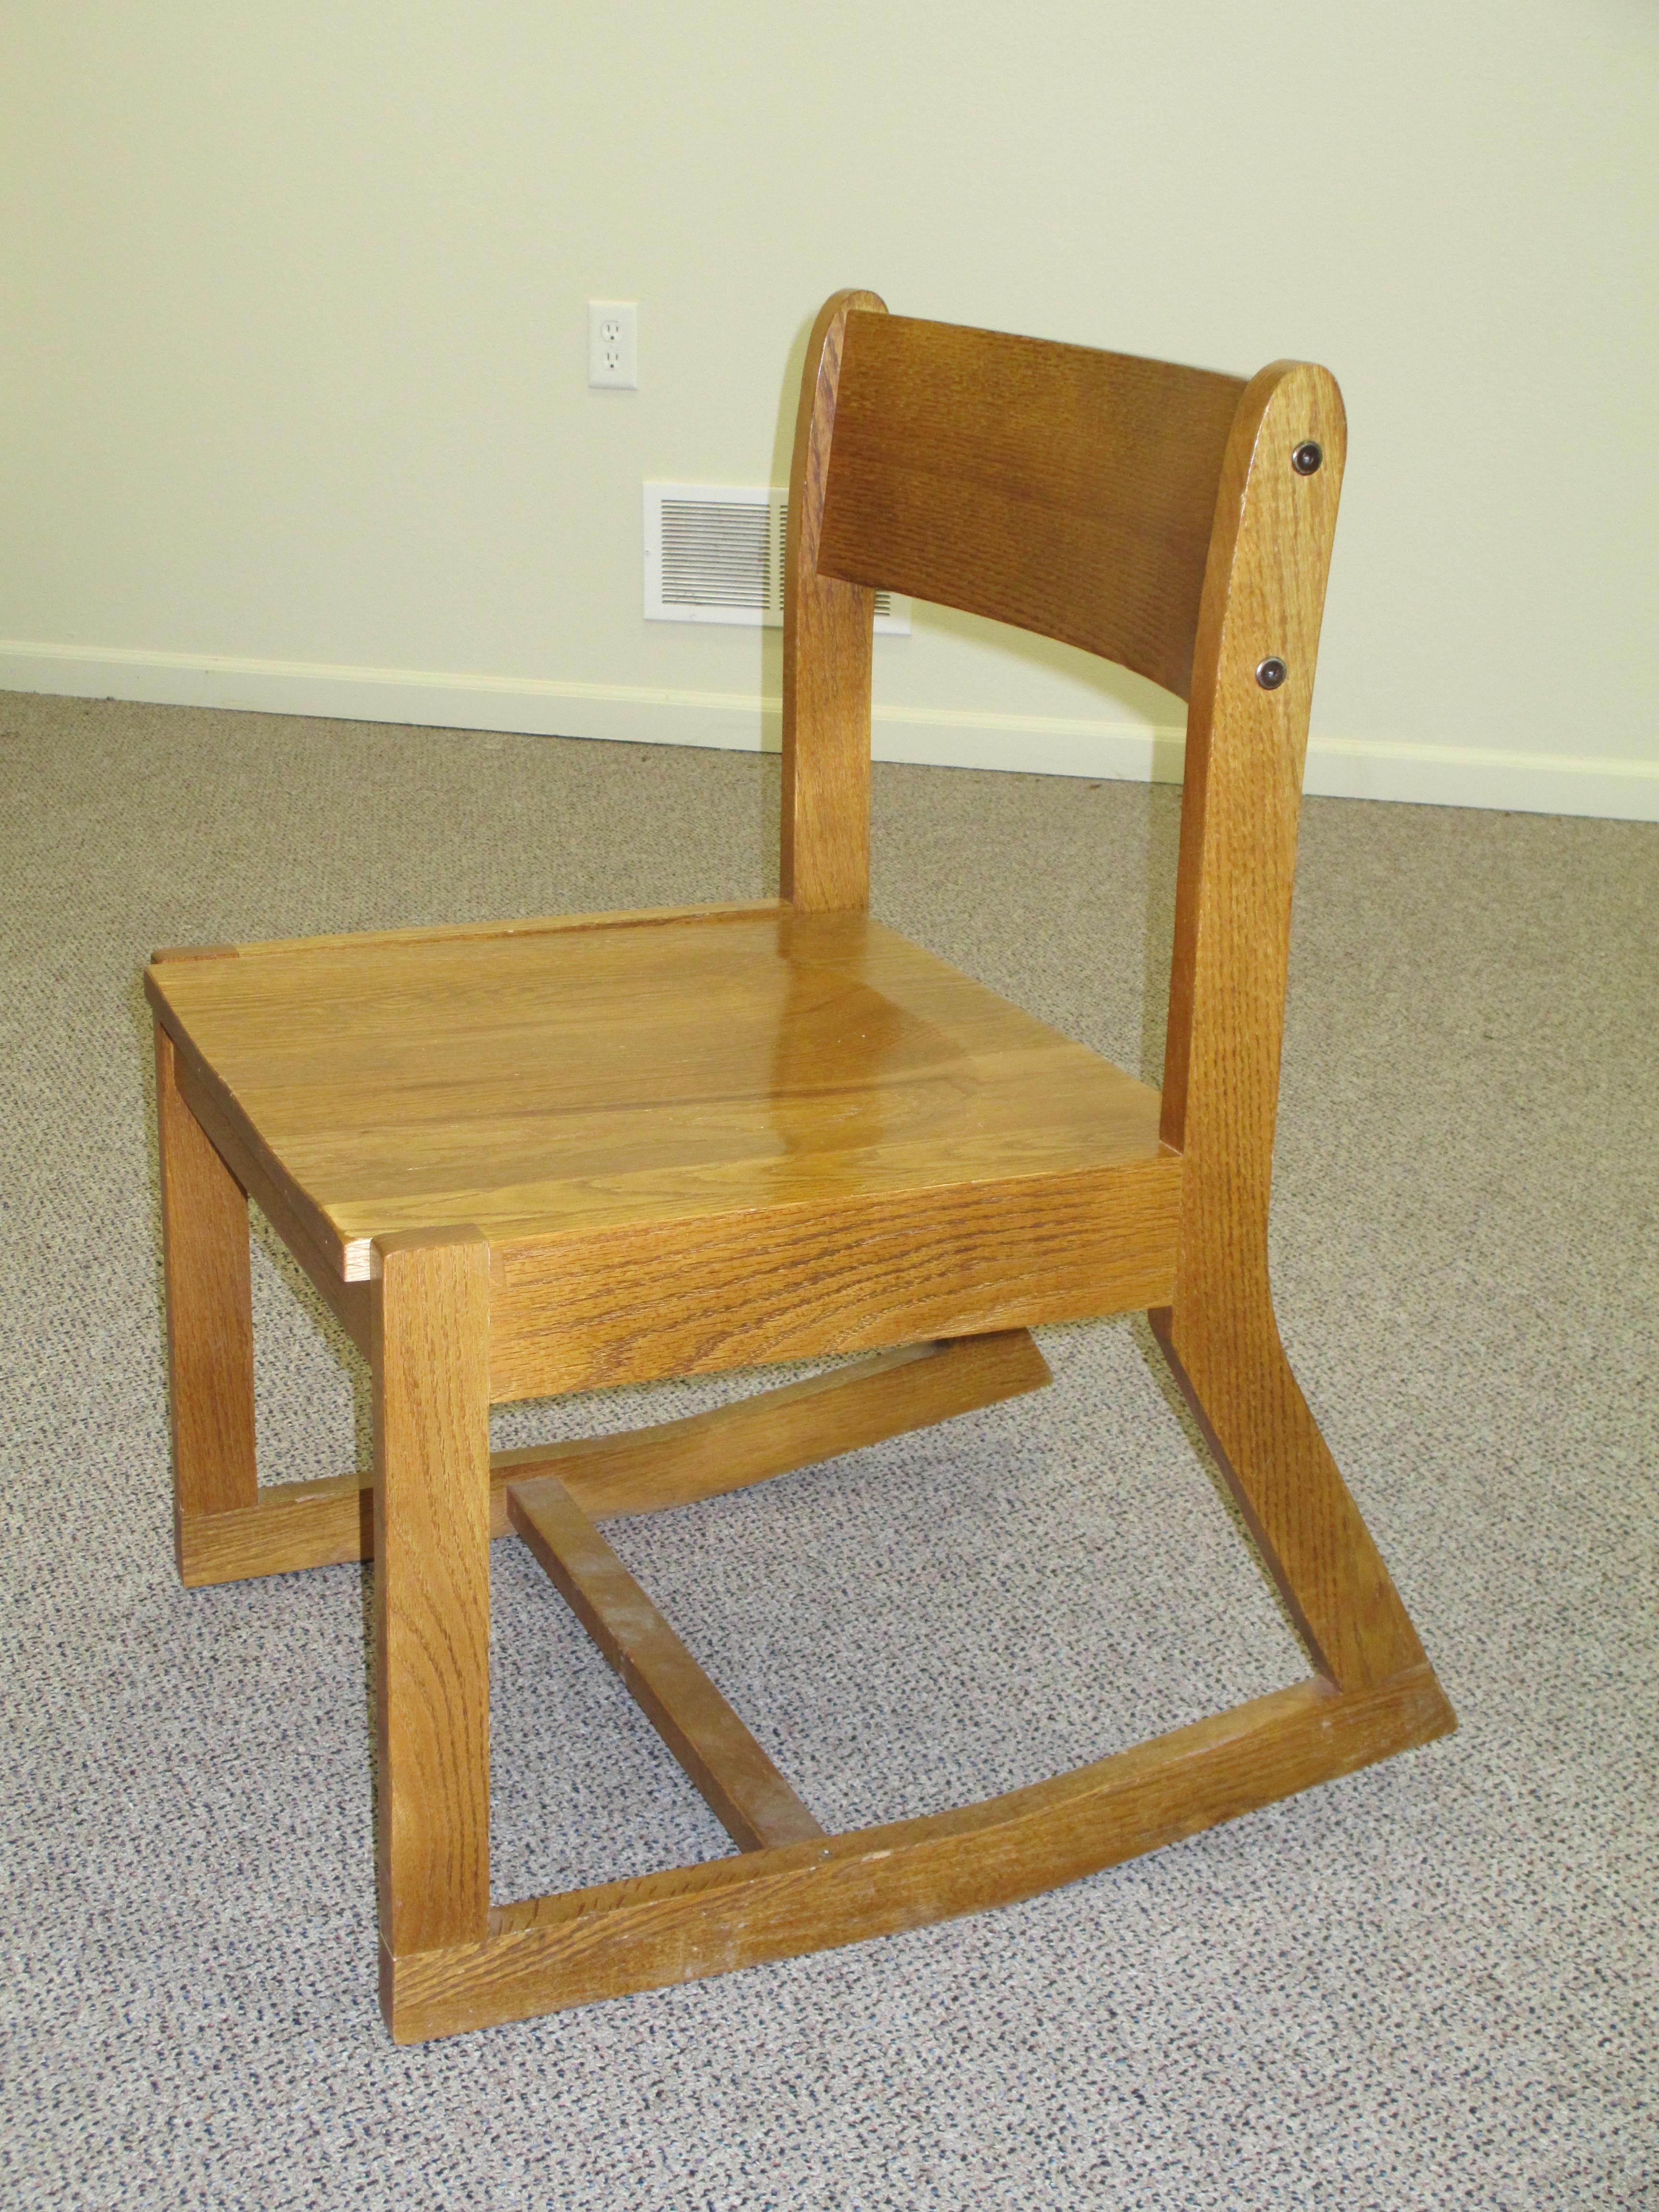 Magnificent From Shuttacrum At Shuttacrum Com Sat Feb 1 08 50 48 2014 Uwap Interior Chair Design Uwaporg